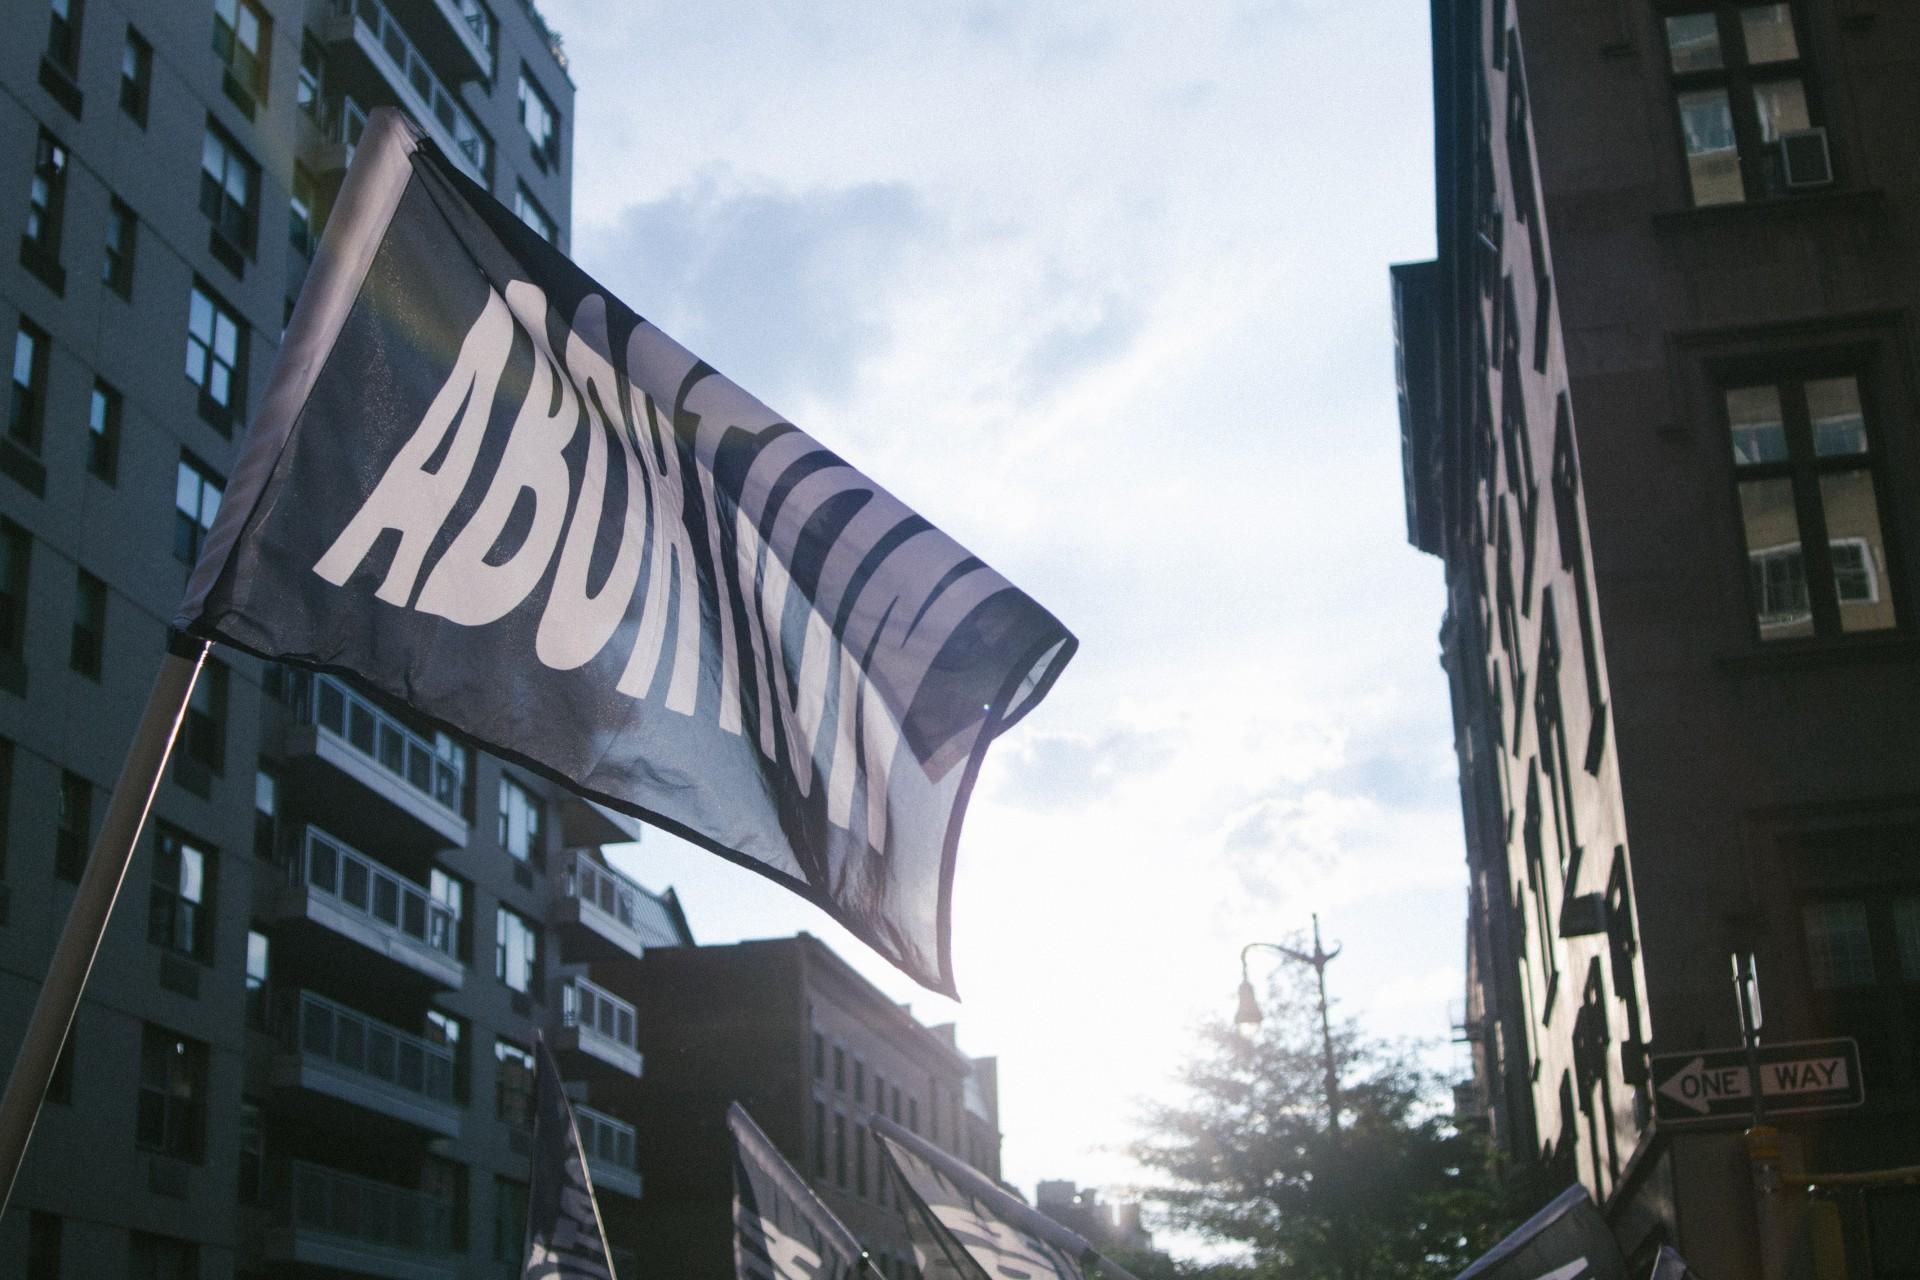 Viva Ruiz, A Joyful Noise: Thank God For Abortion Pride Parade Float. Photo: Elliot Luscombe